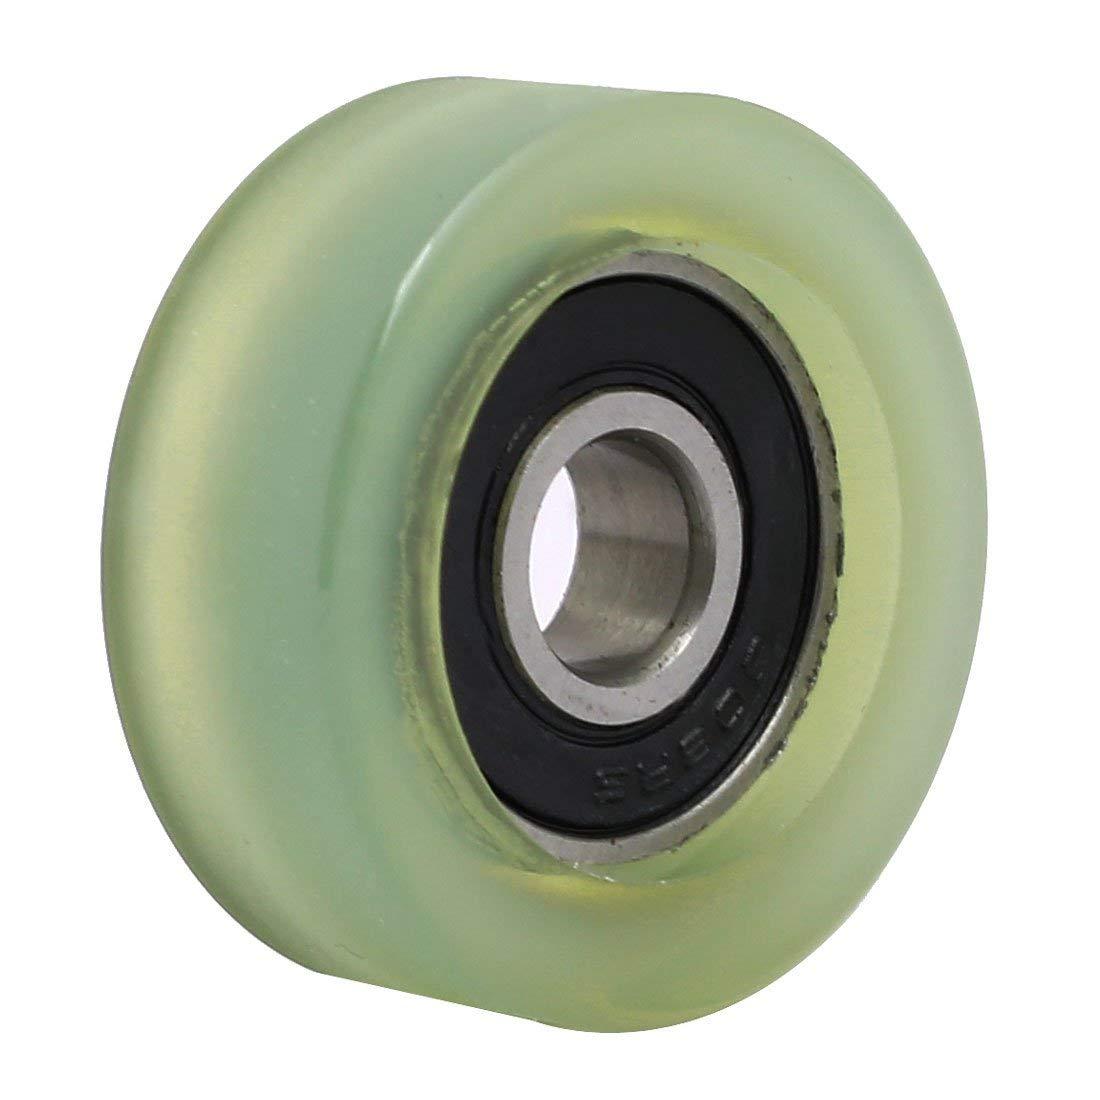 MroMax Roller Idler Bearing Pulley Sliding Conveyor Wheel Clear 1Pcs 8mmx32mmx12mm